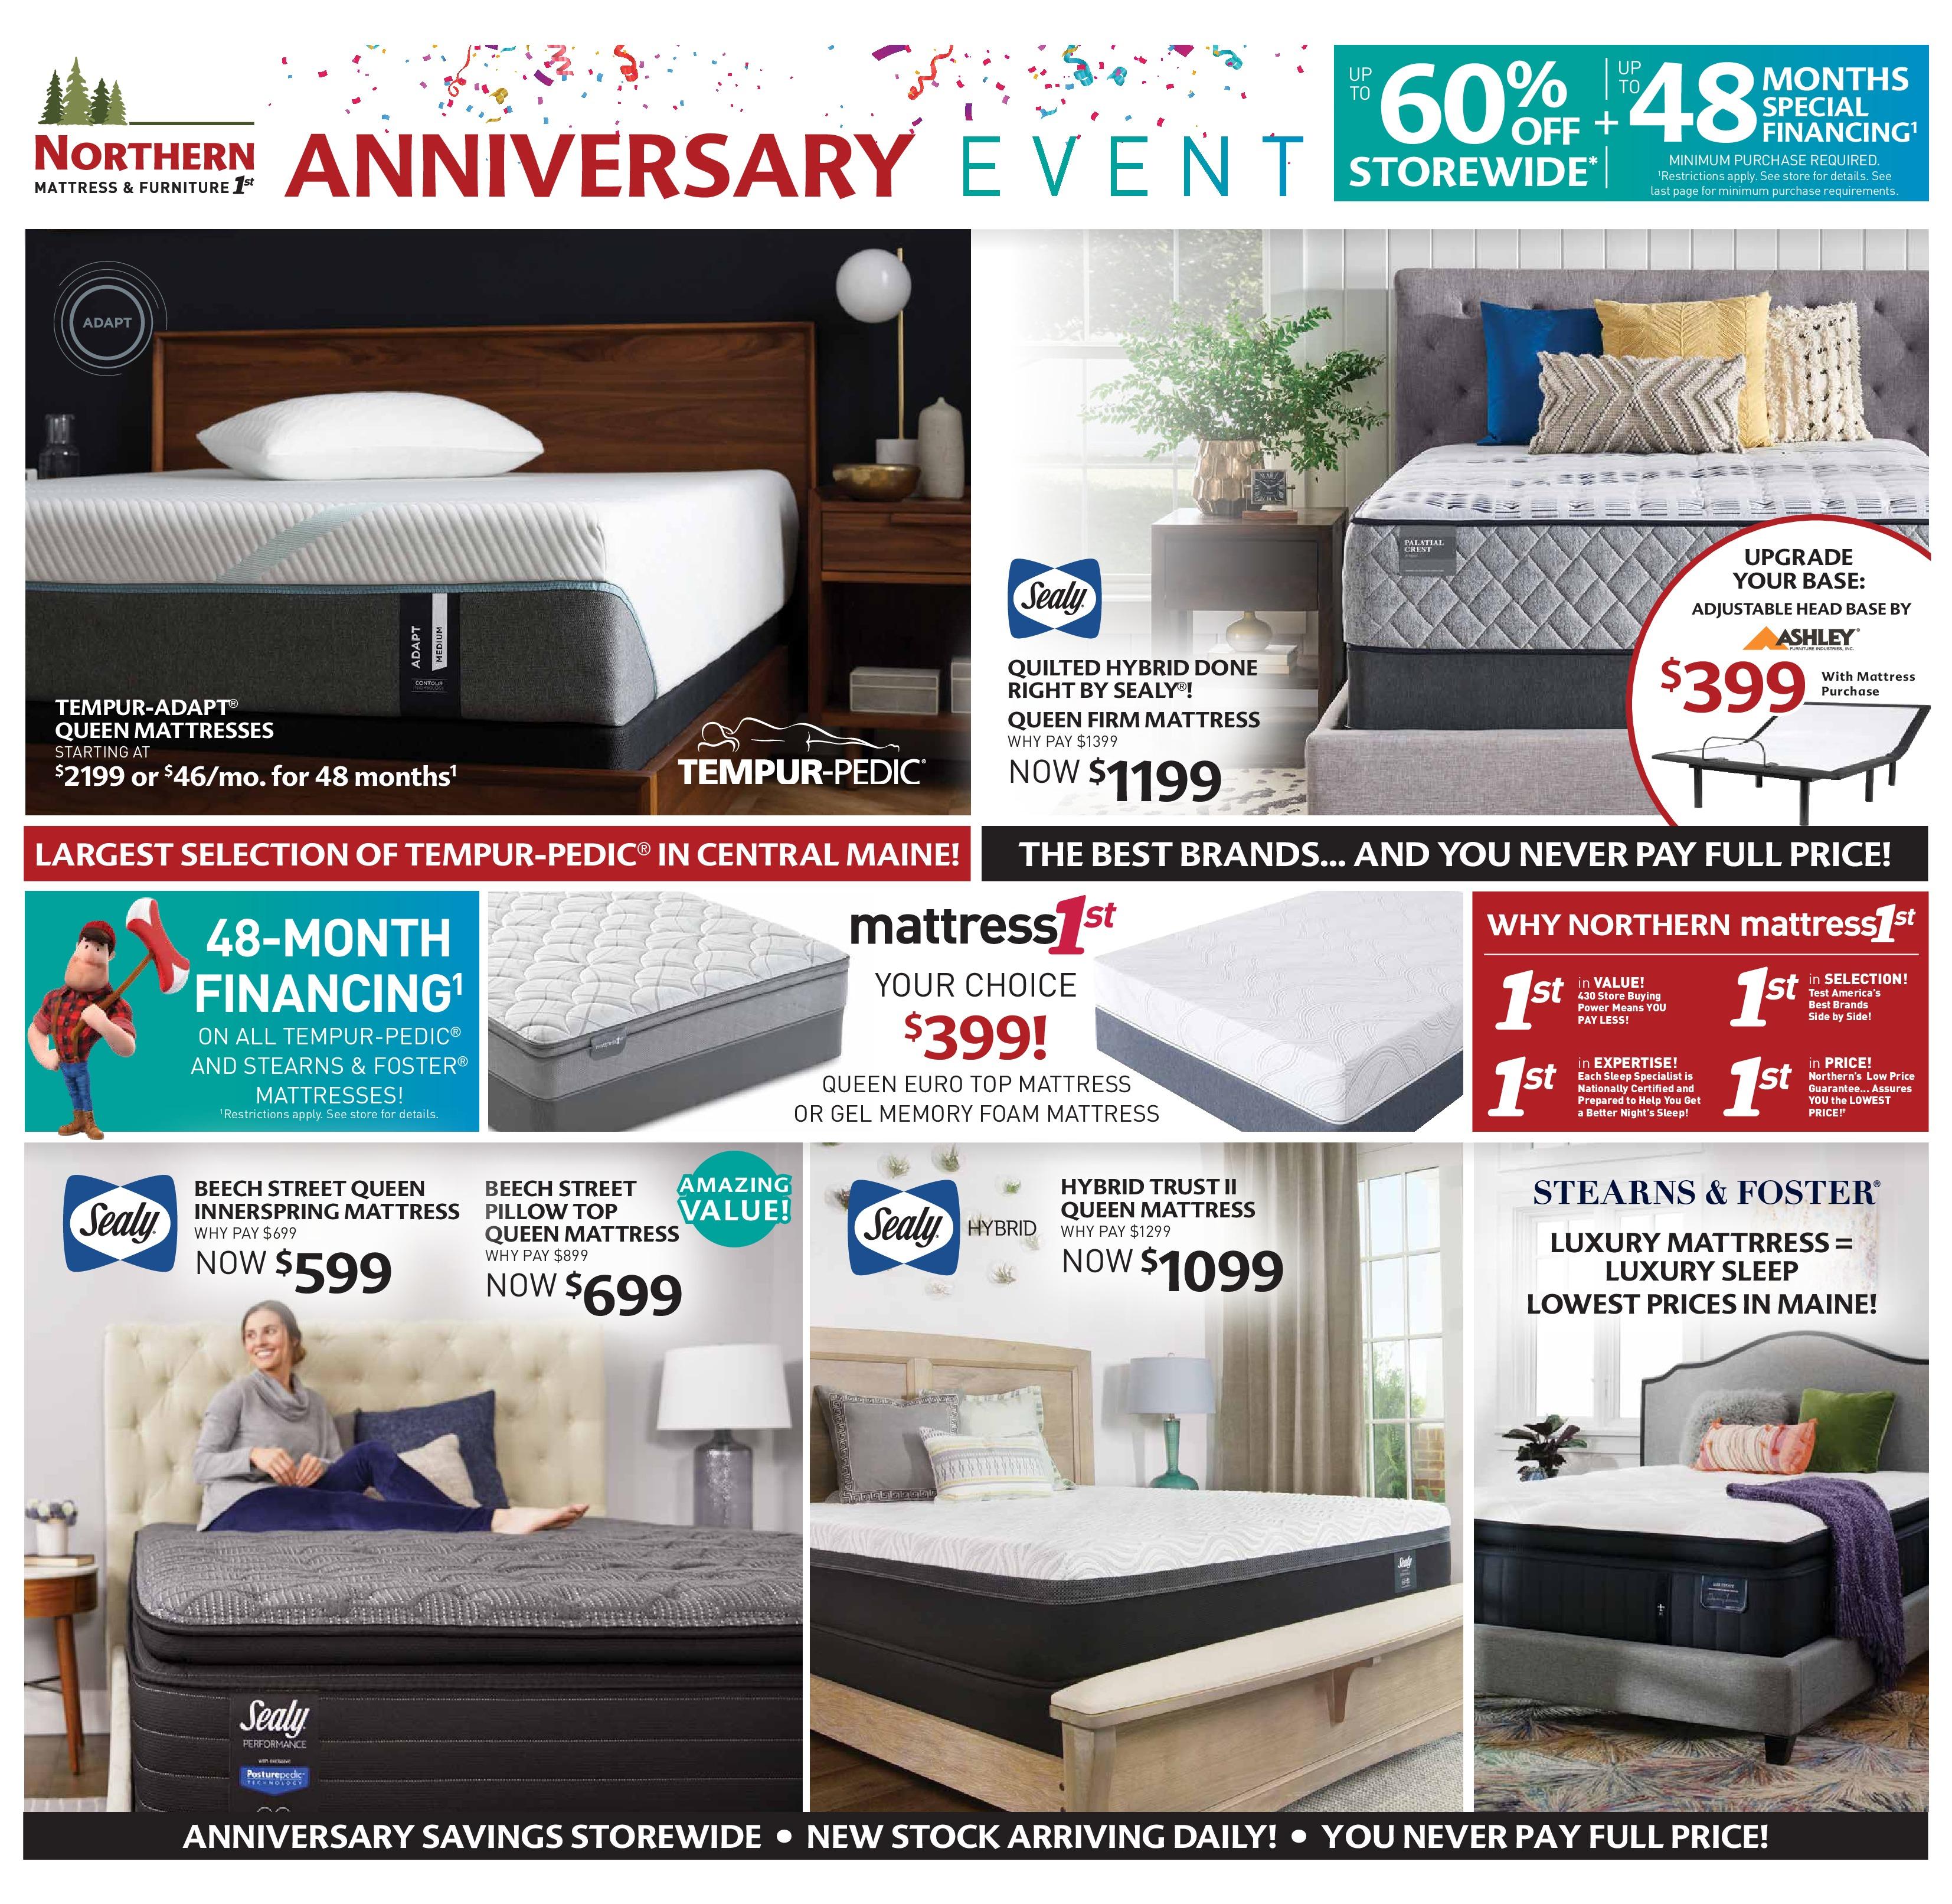 NOMA-9021-20101-Anniversary-WebSp